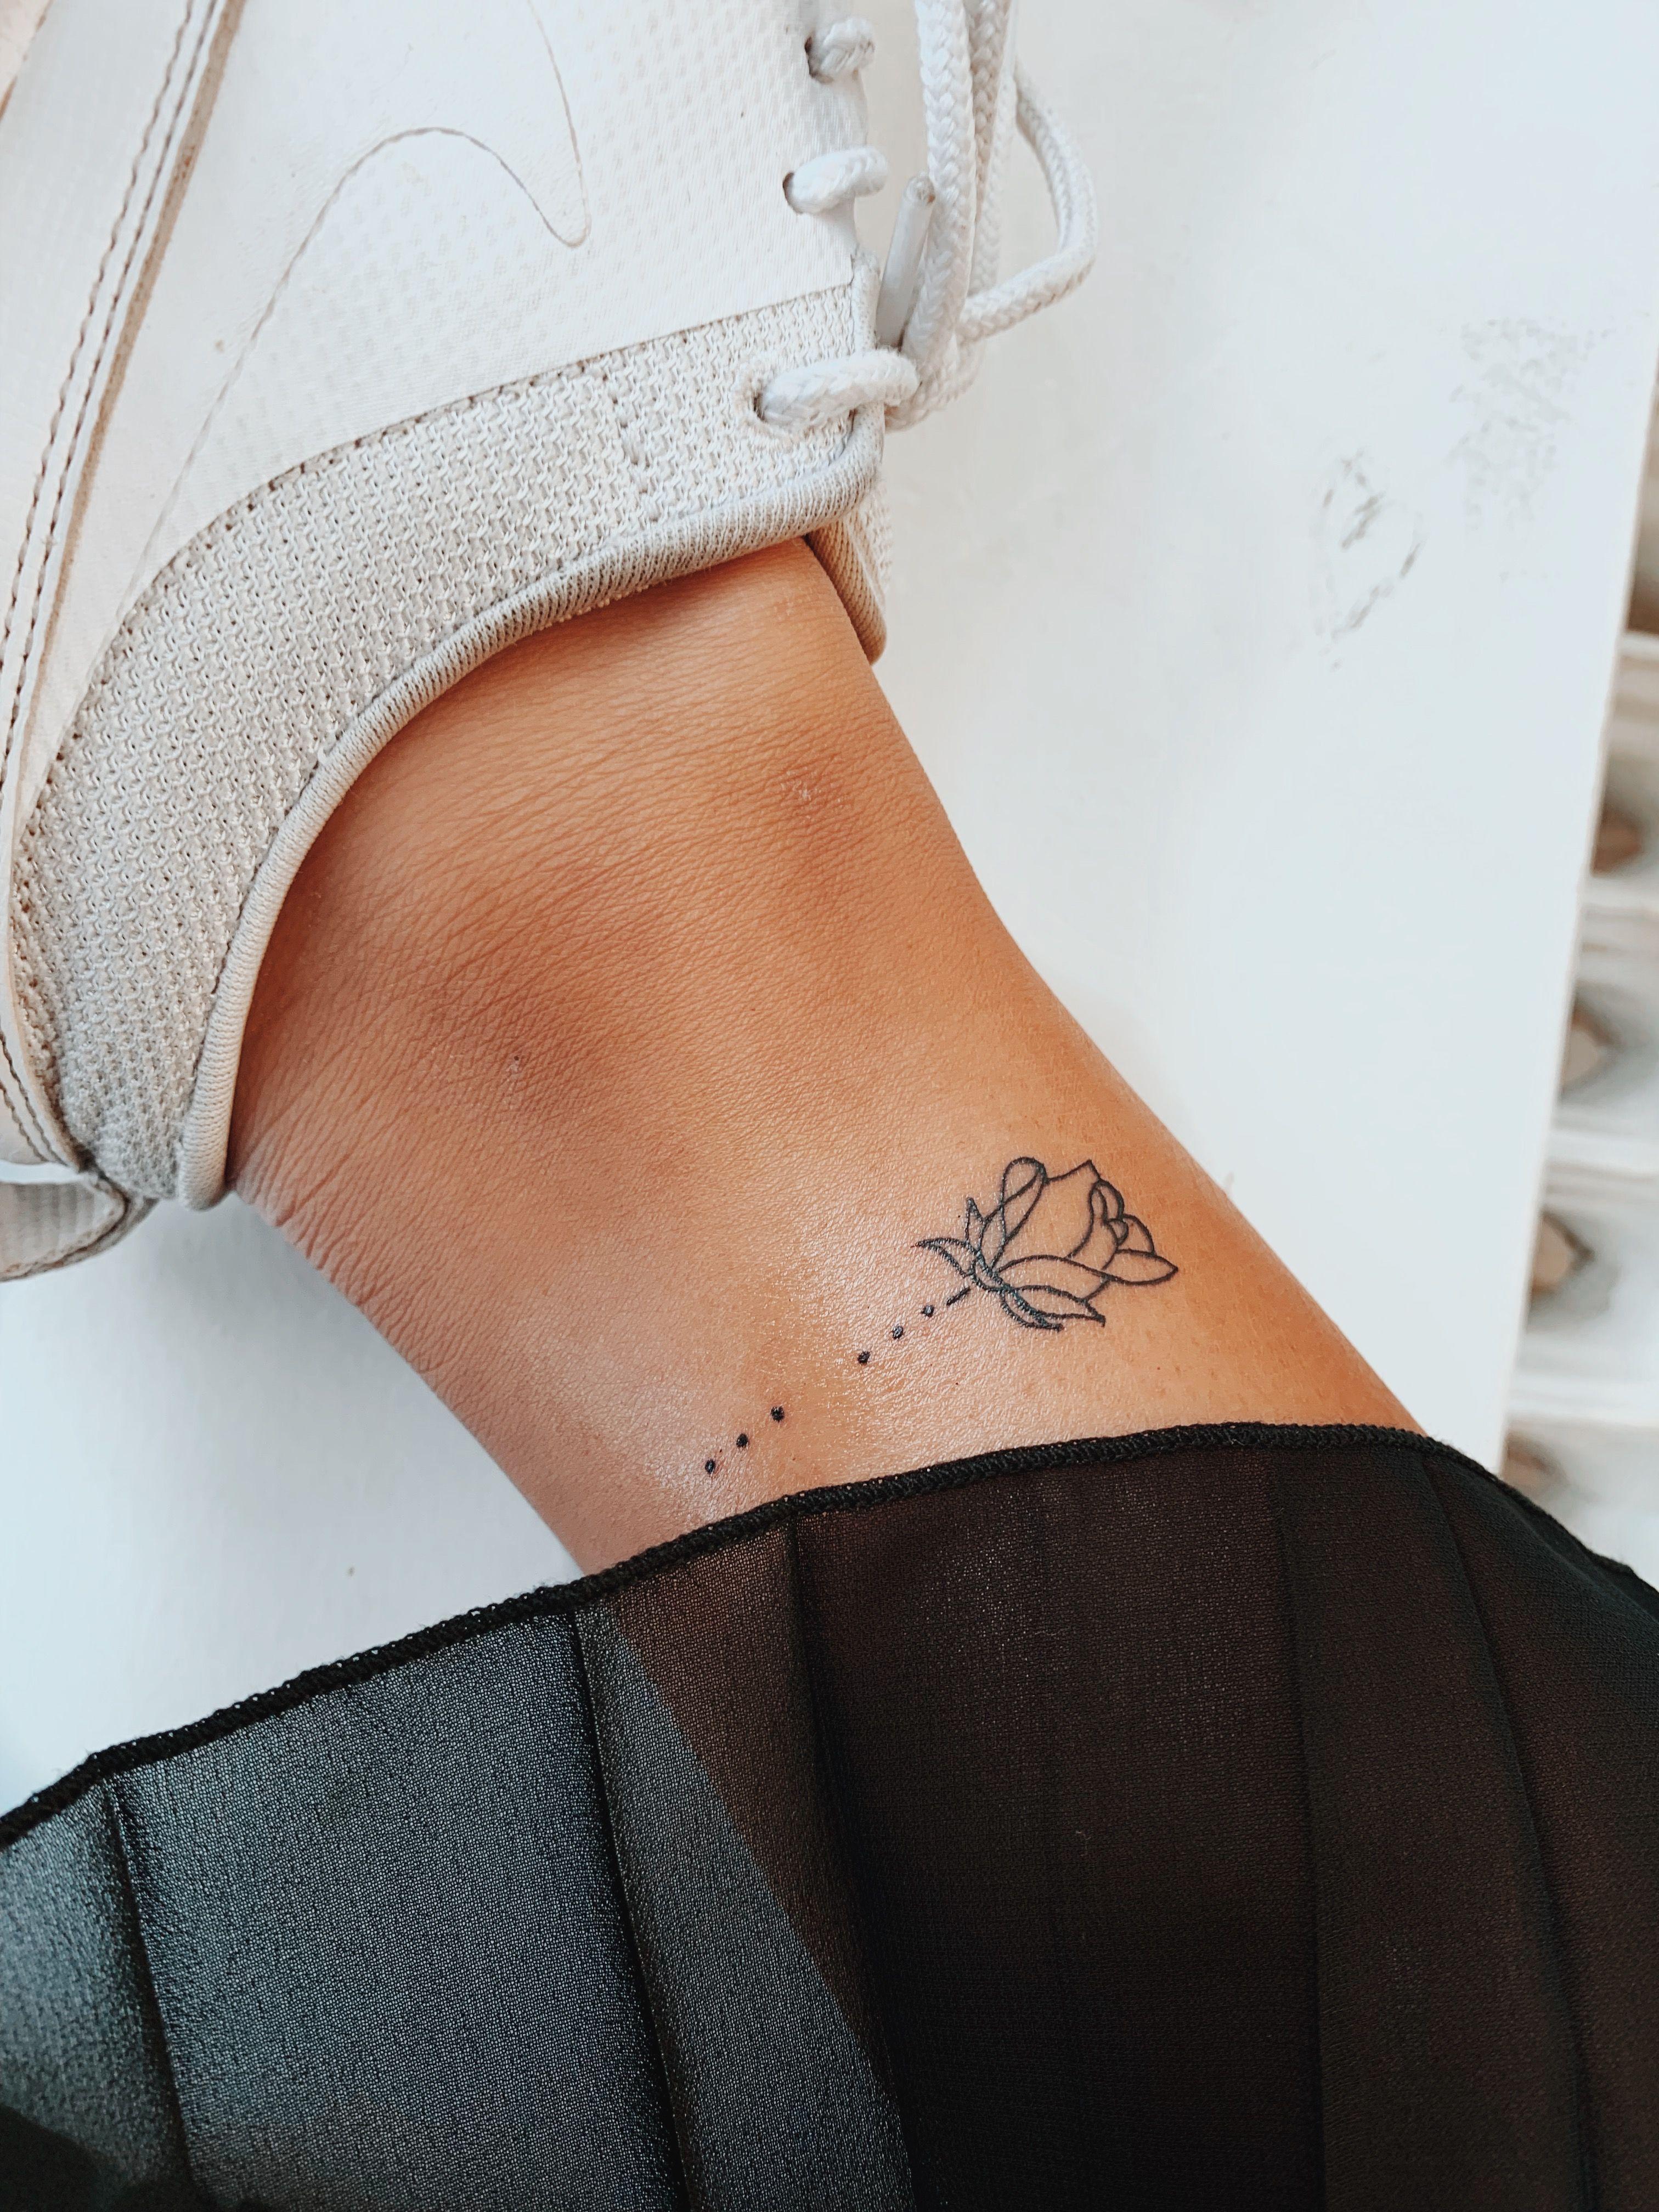 Photo of Rose tattoo